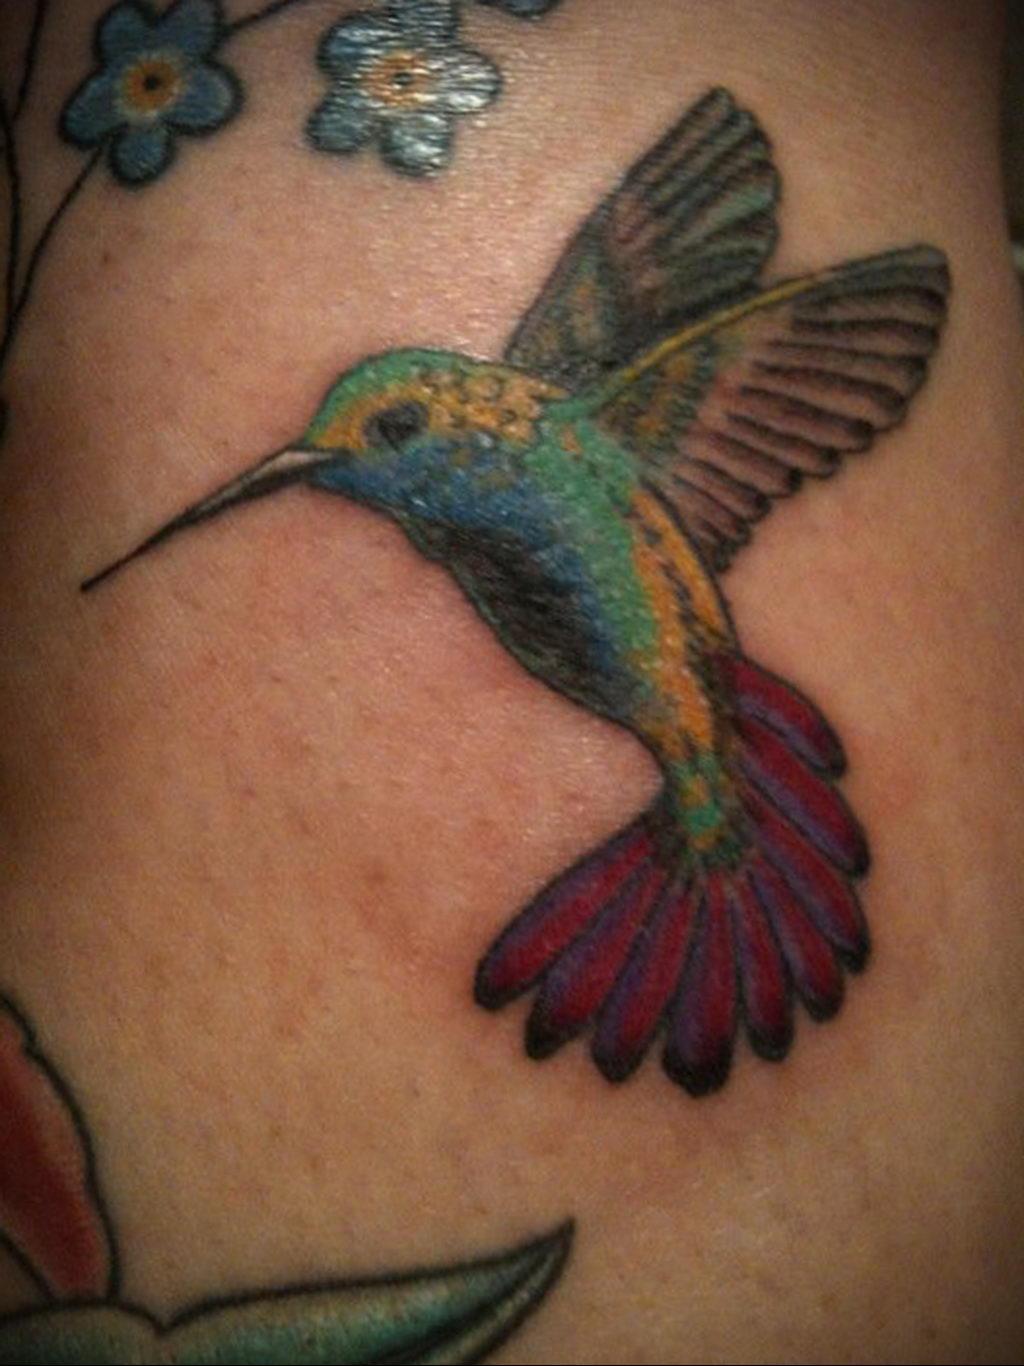 Фото тату про любовь рисунок Птица 03.02.2020 №058 -bird tattoo- tatufoto.com